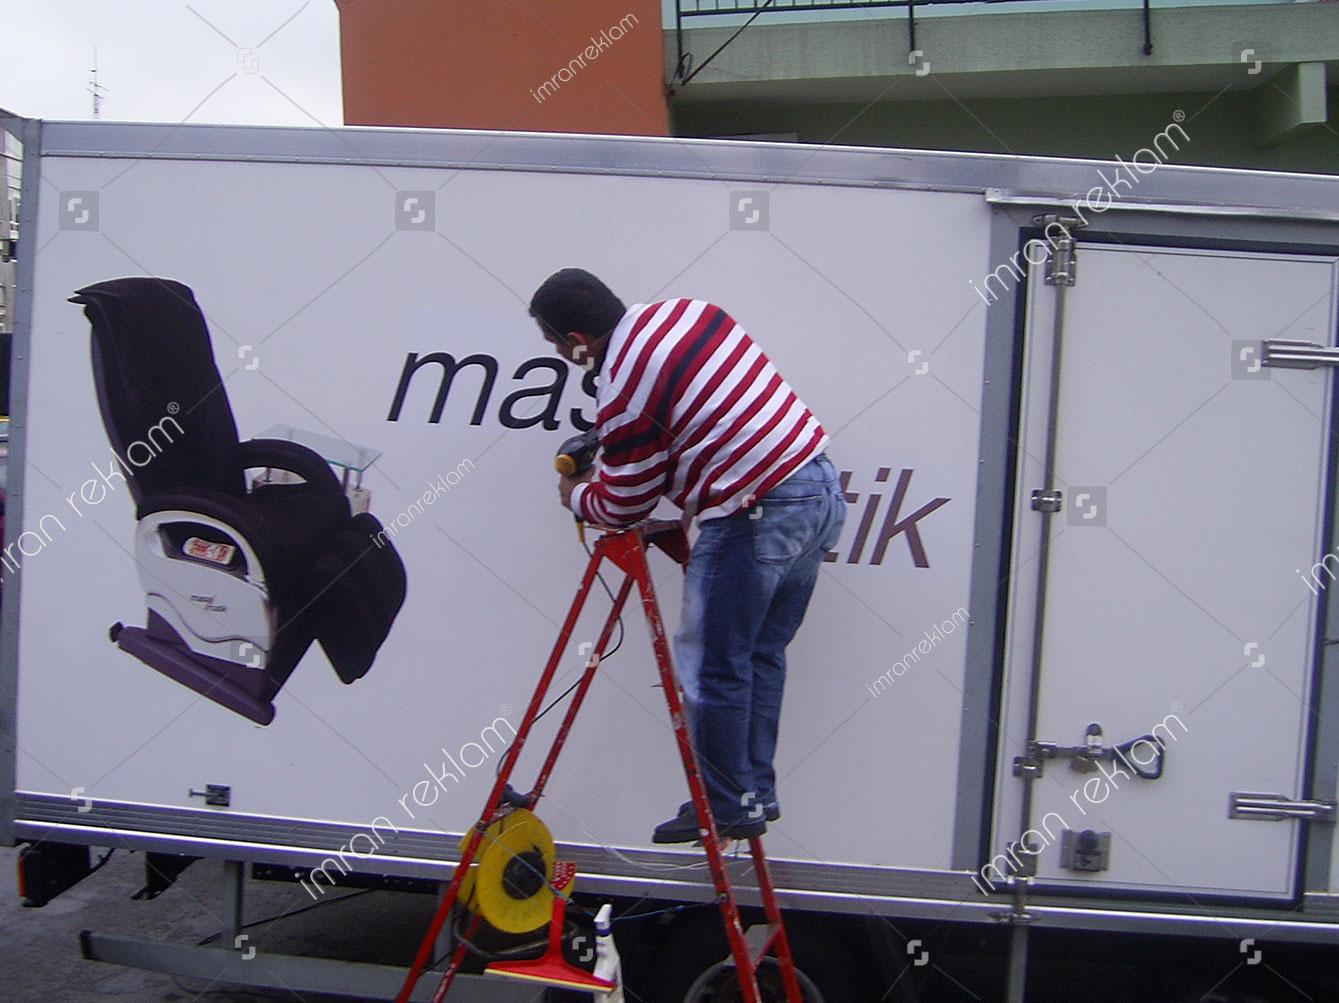 kamyonet-kasası-kaplama